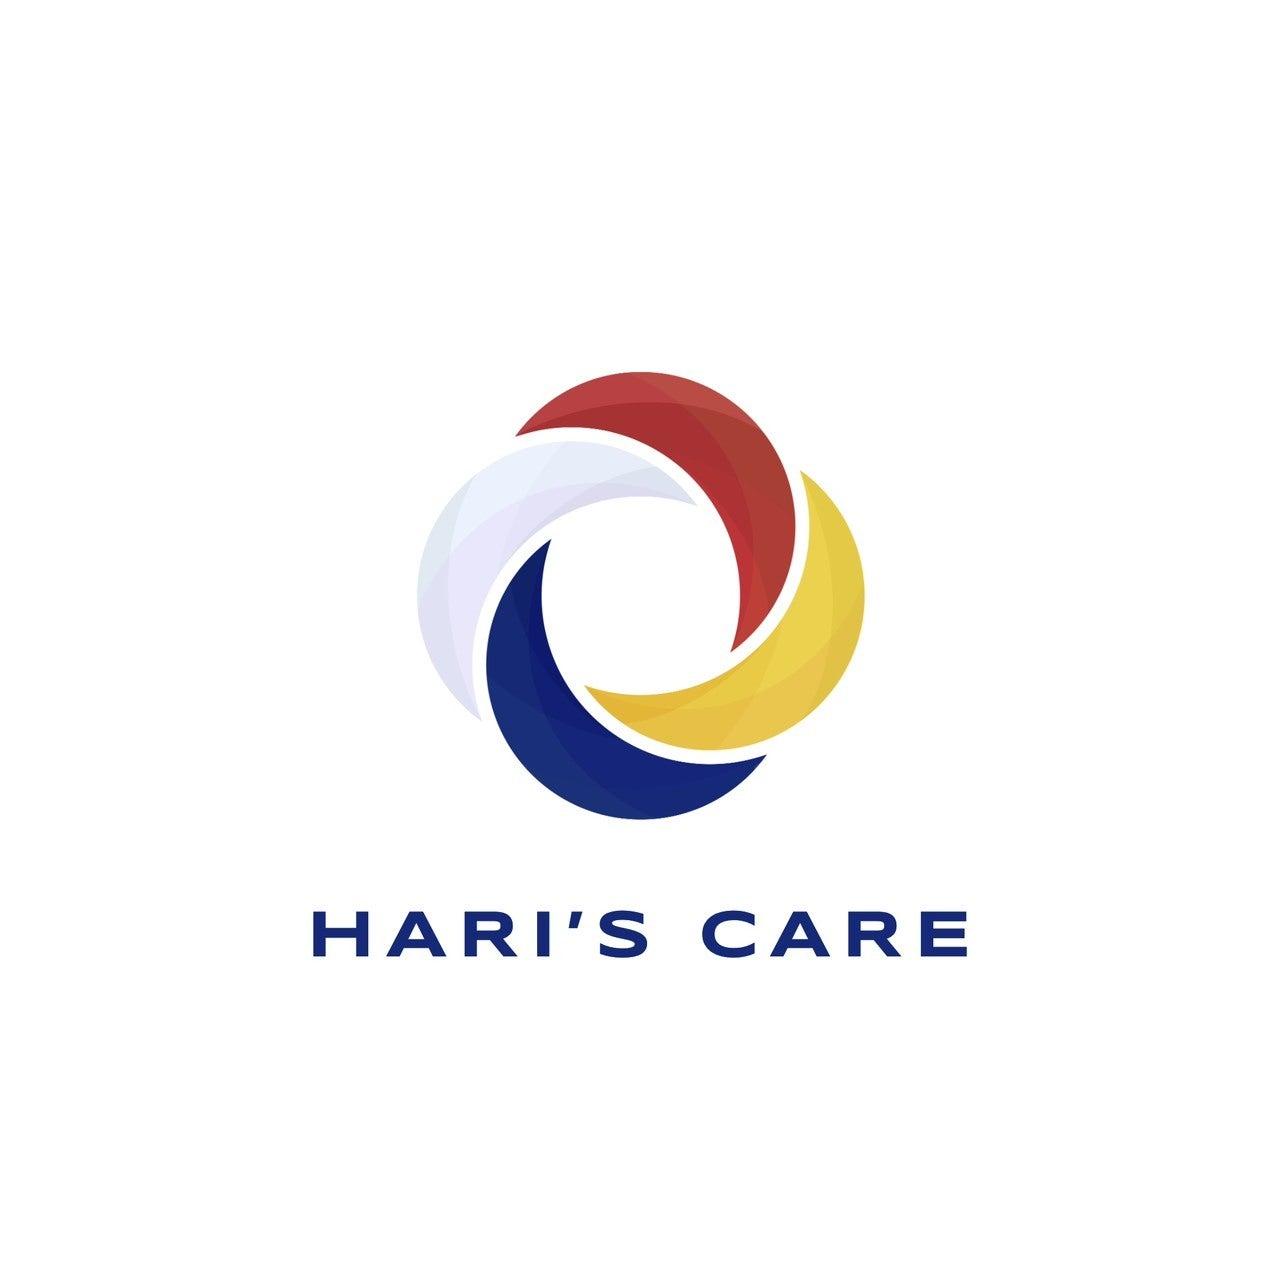 HARI's CARE